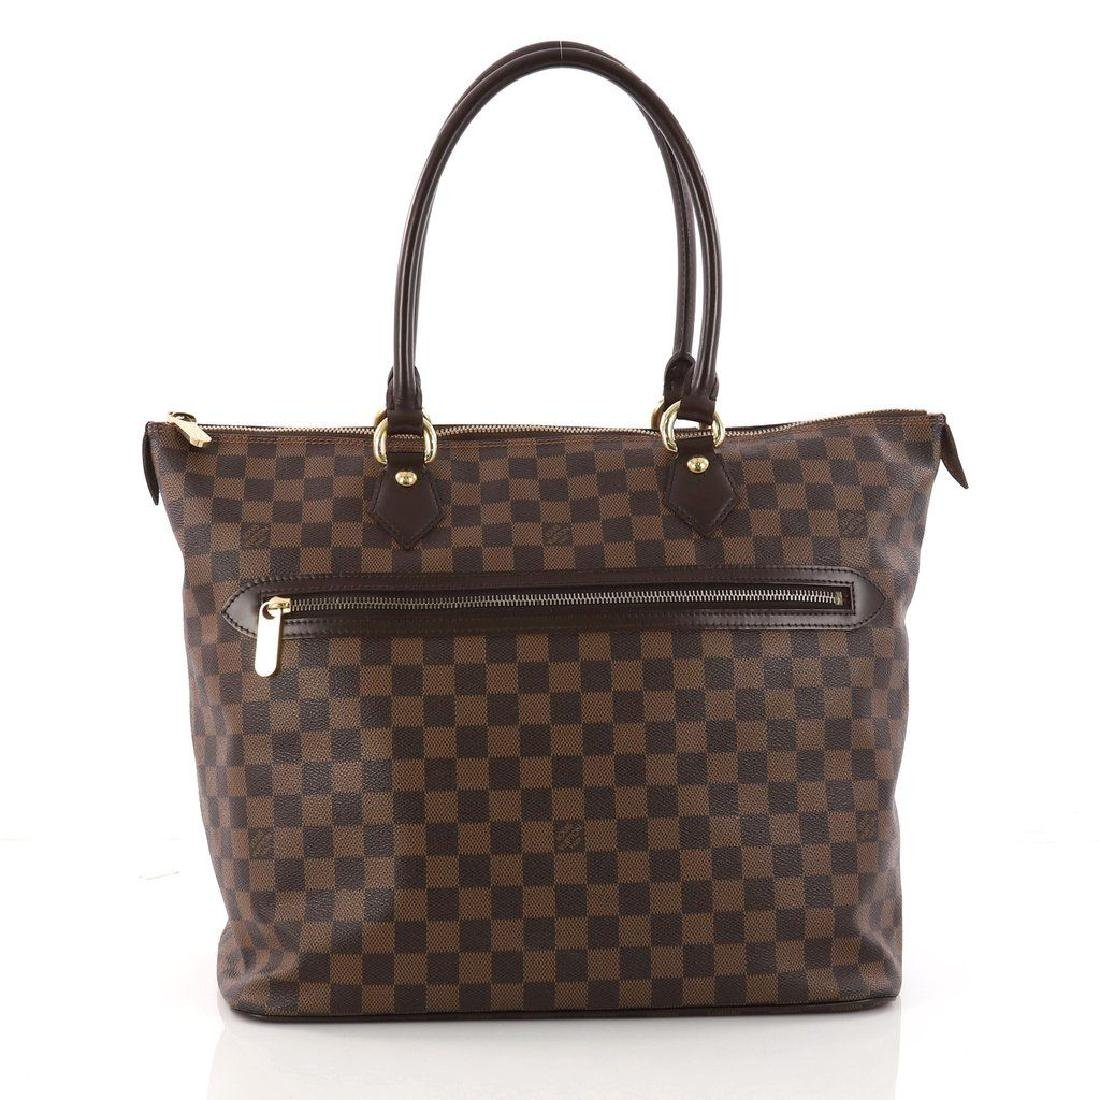 Louis Vuitton Damier Ebene Saleya GM Tote Shoulder Bag - 2